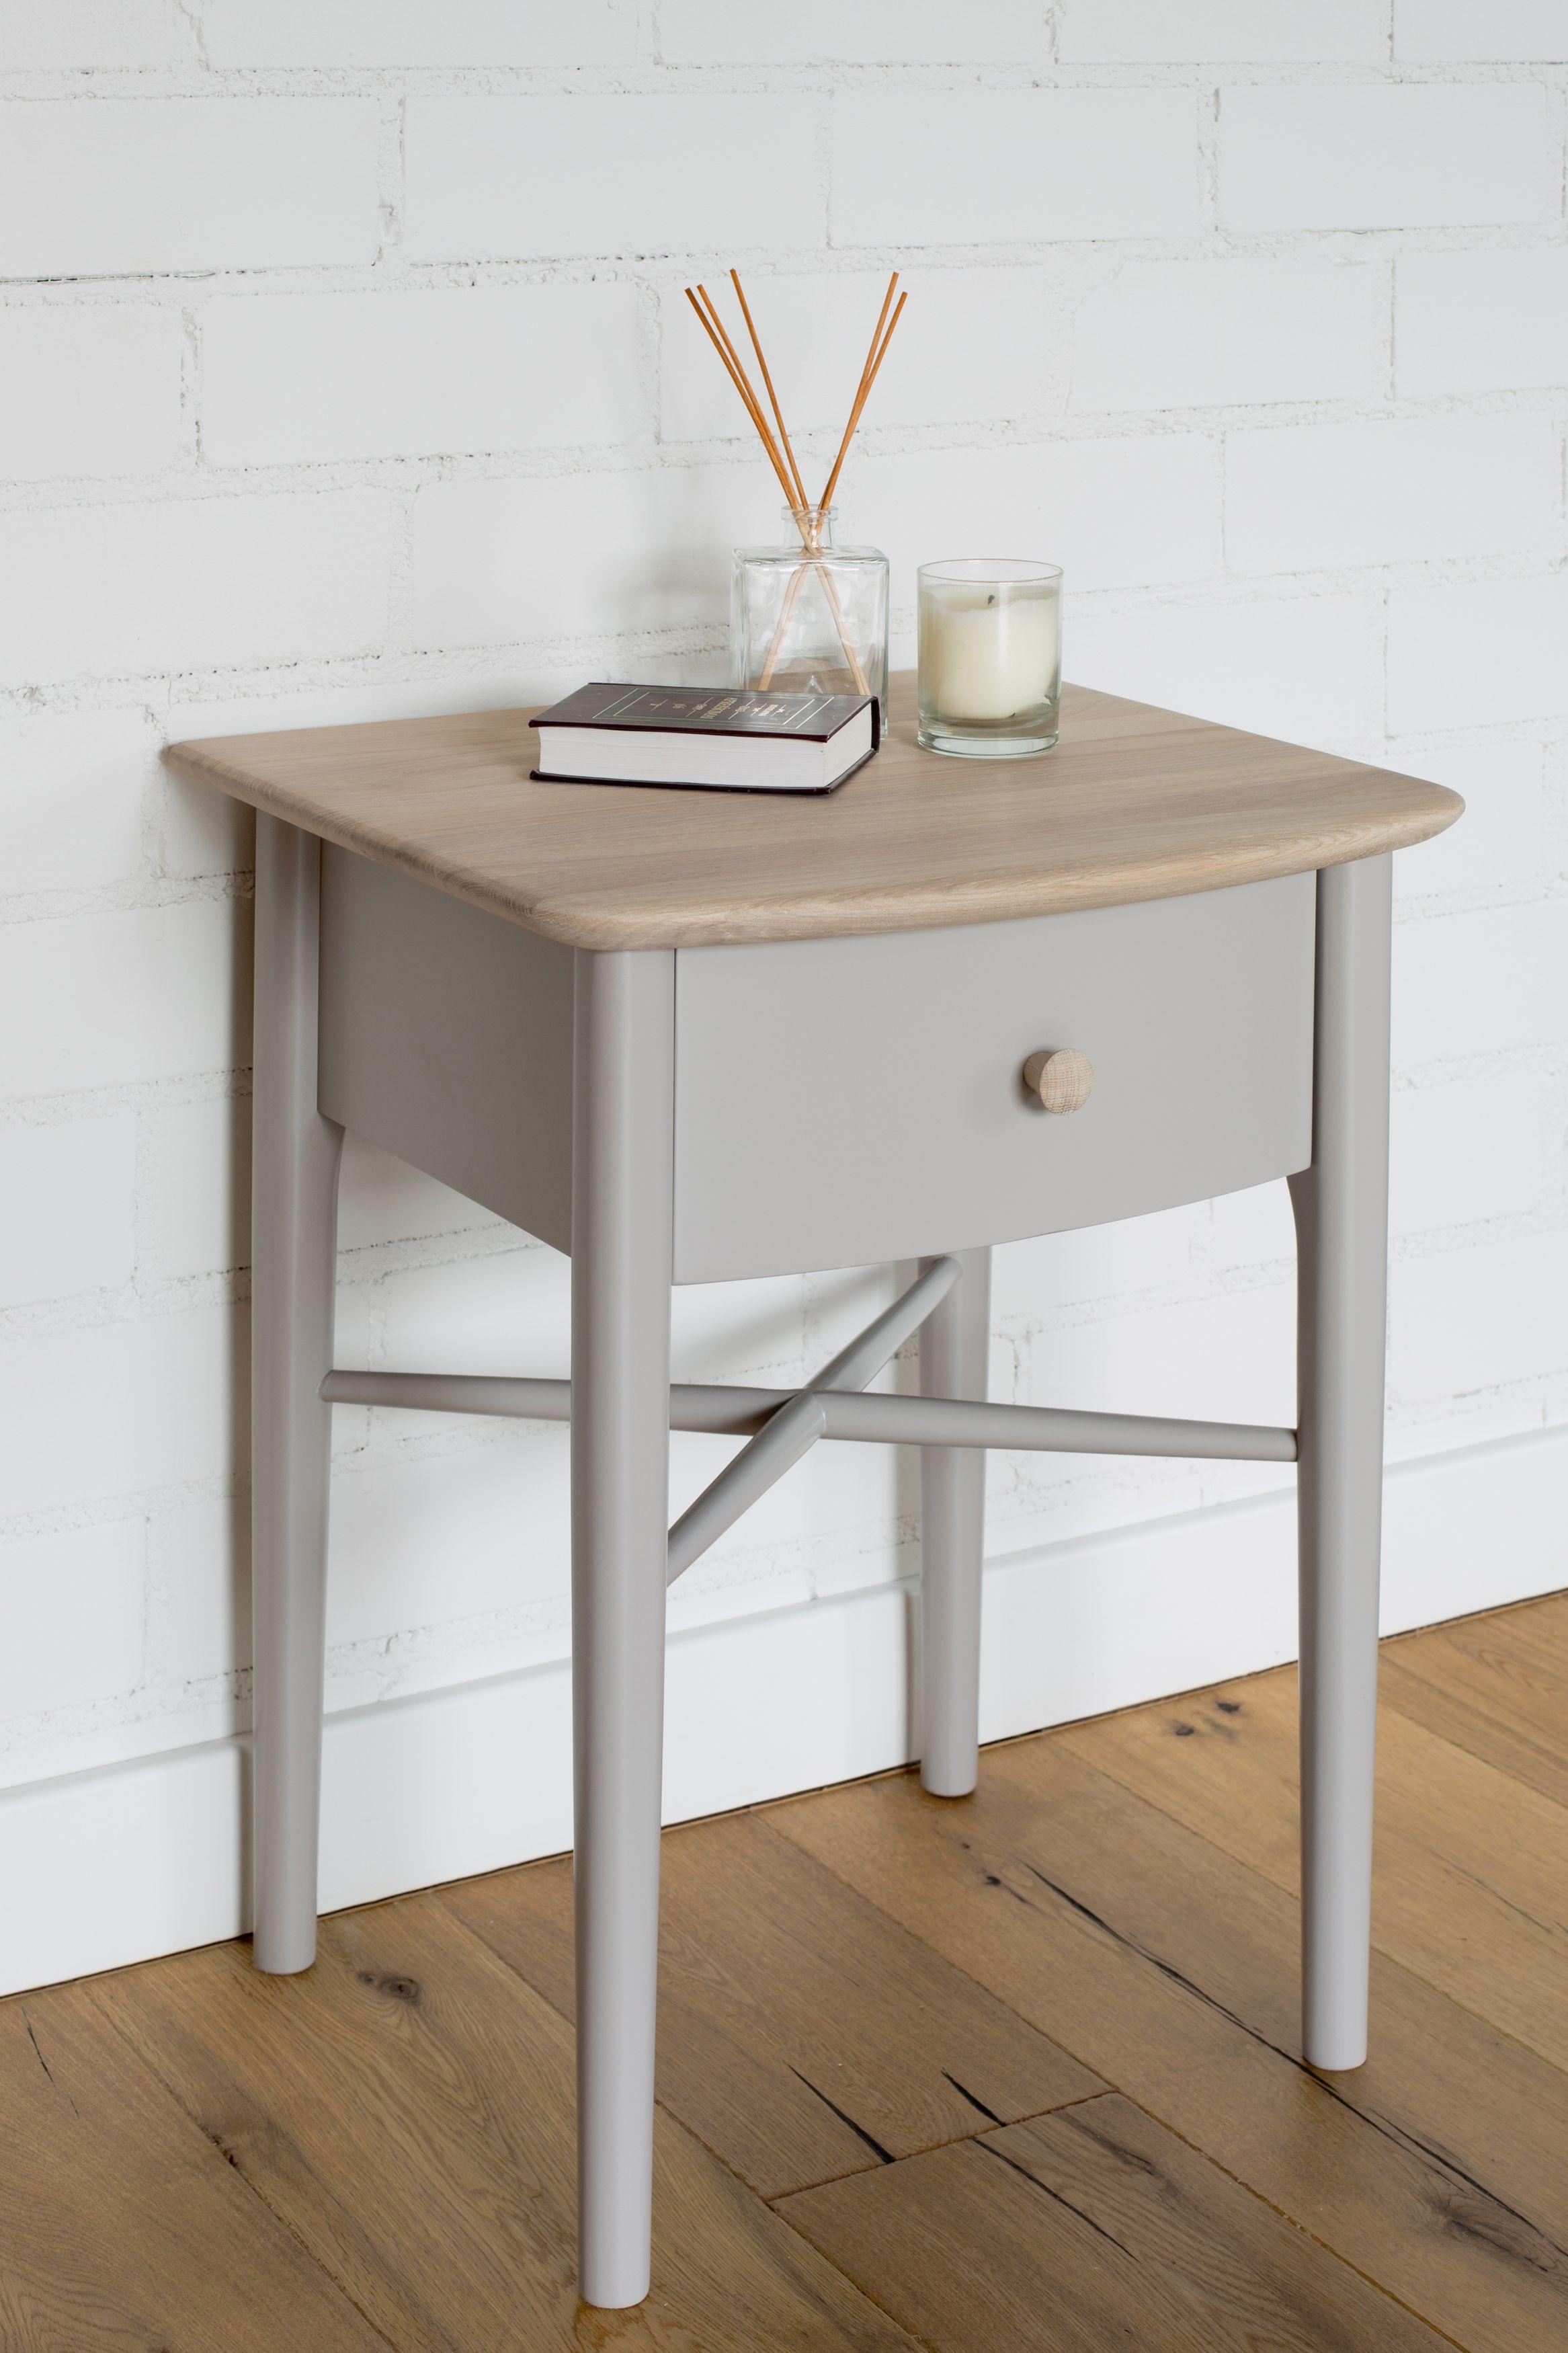 Elise Bedroom range: bedside chest 1 drawer / Elise Bedroom kolekcija:  spintelė prie lovos su stalčiumi.